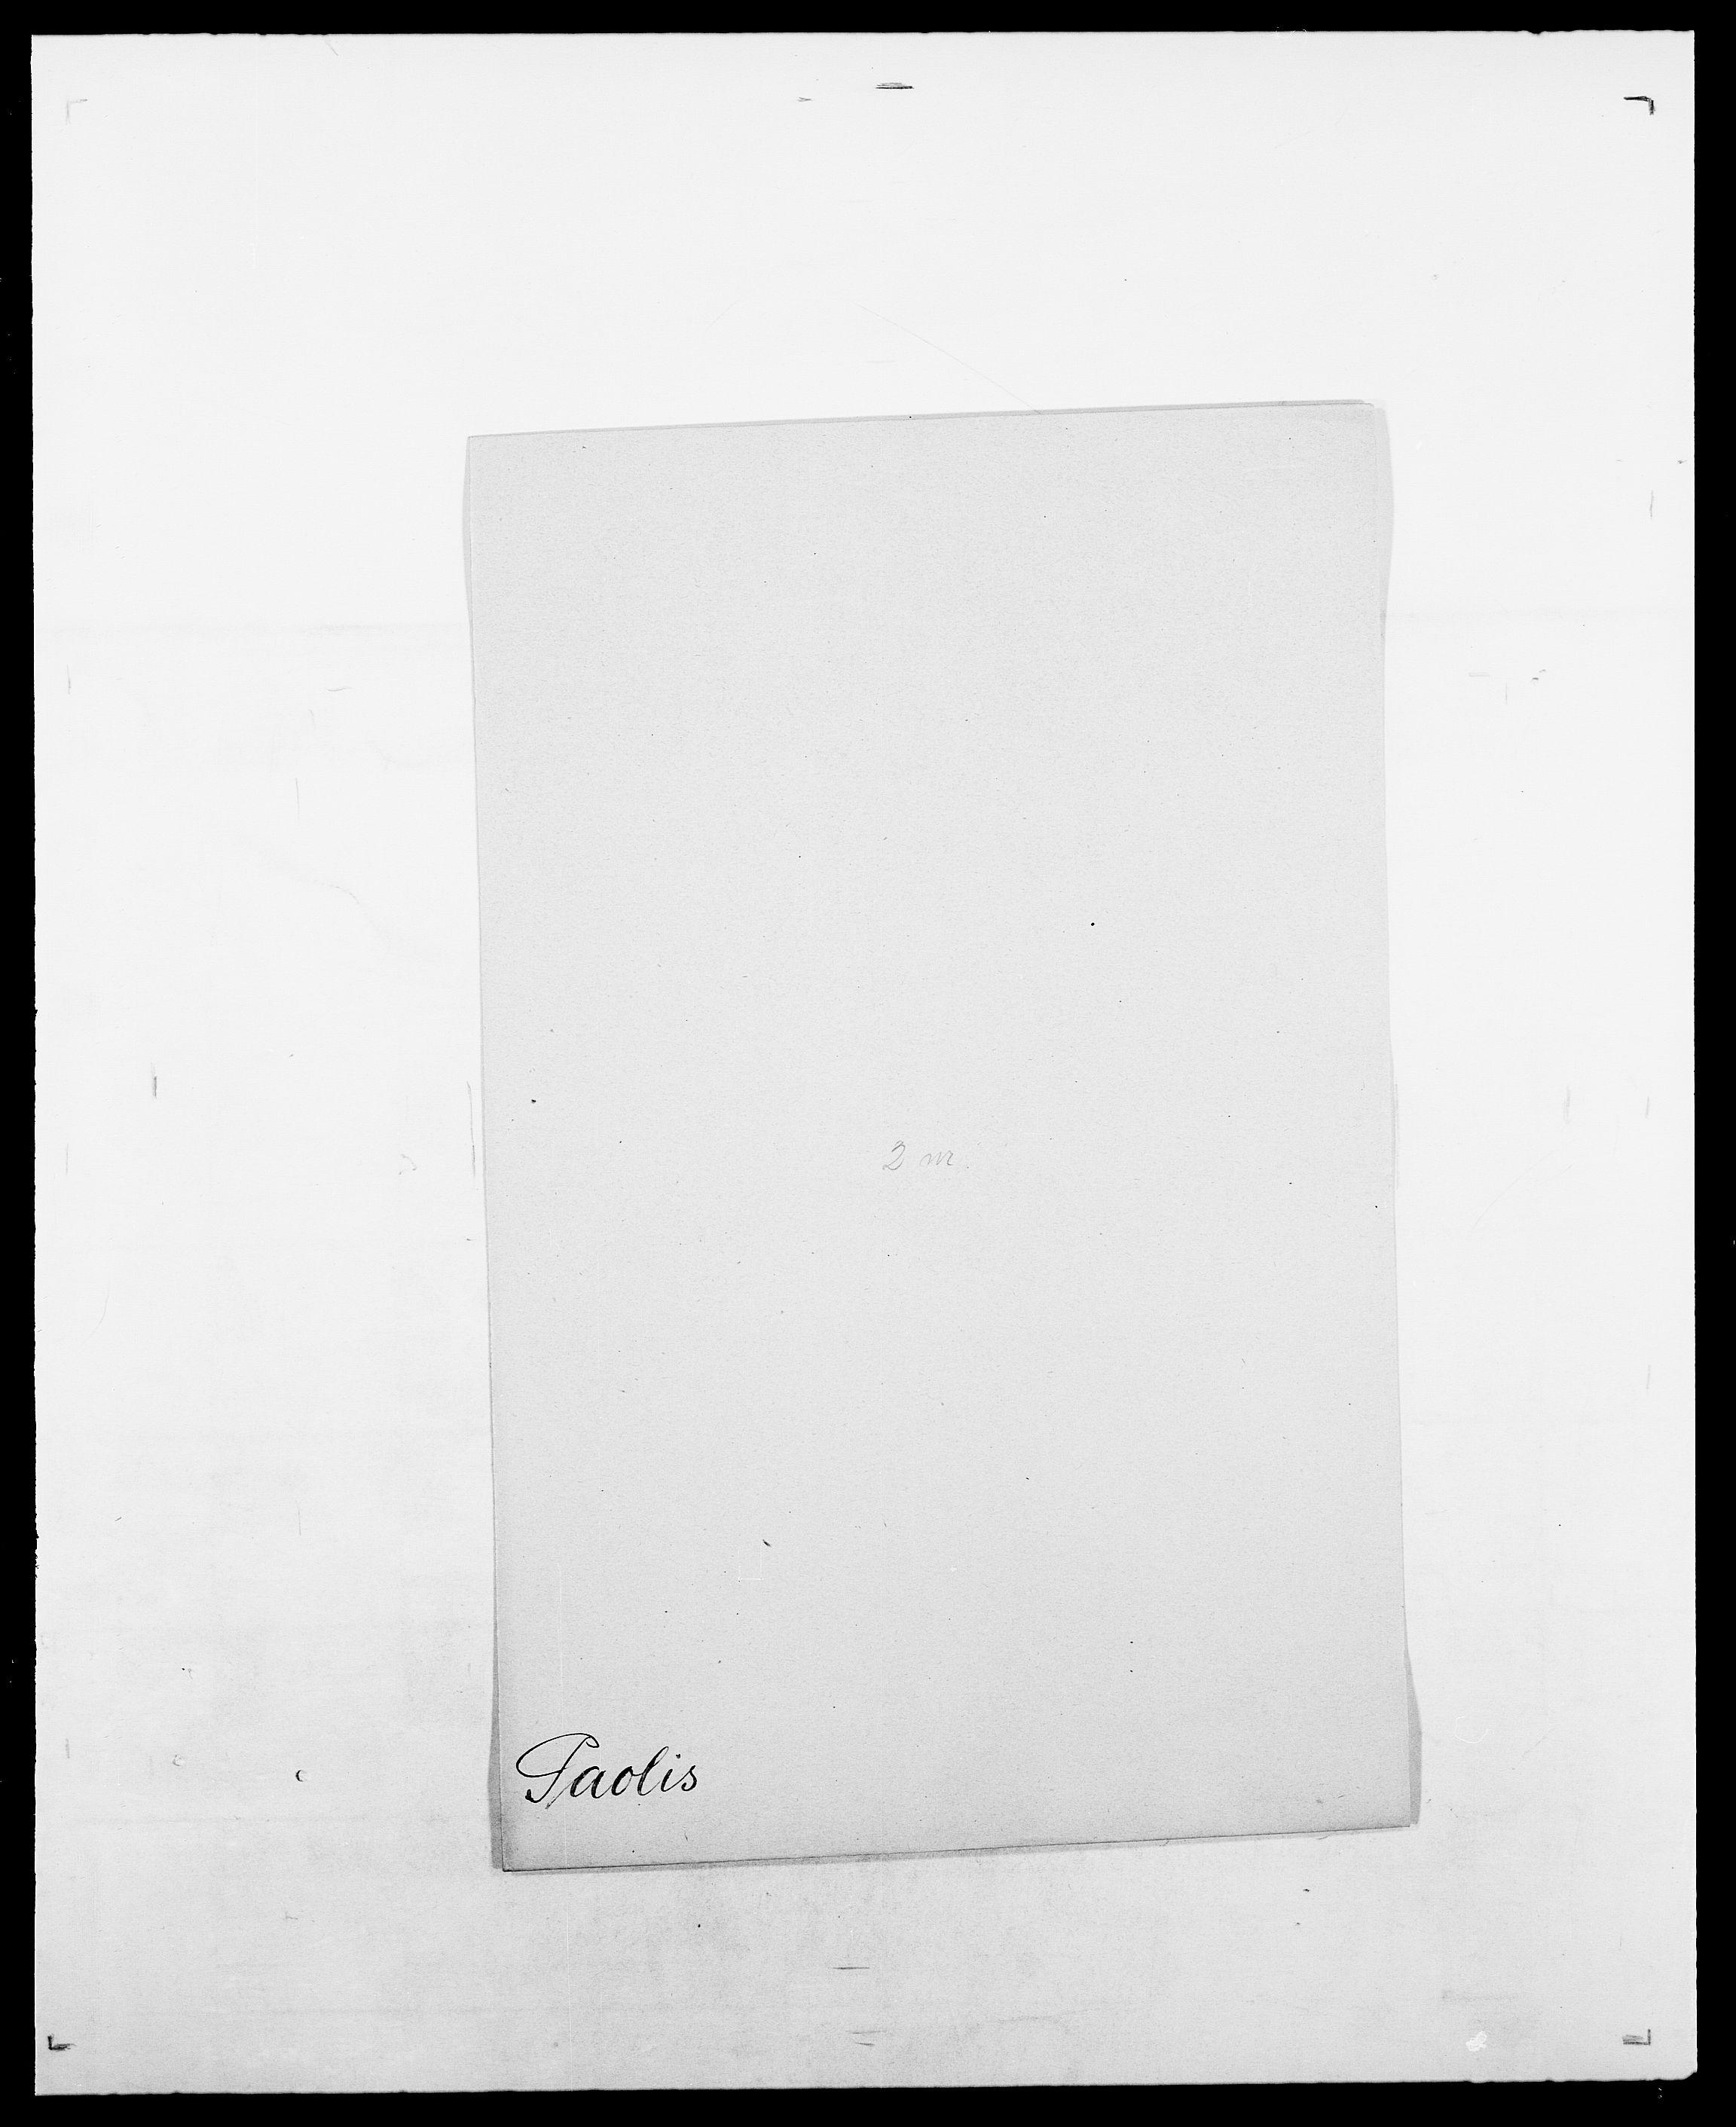 SAO, Delgobe, Charles Antoine - samling, D/Da/L0030: Paars - Pittelkov, s. 91